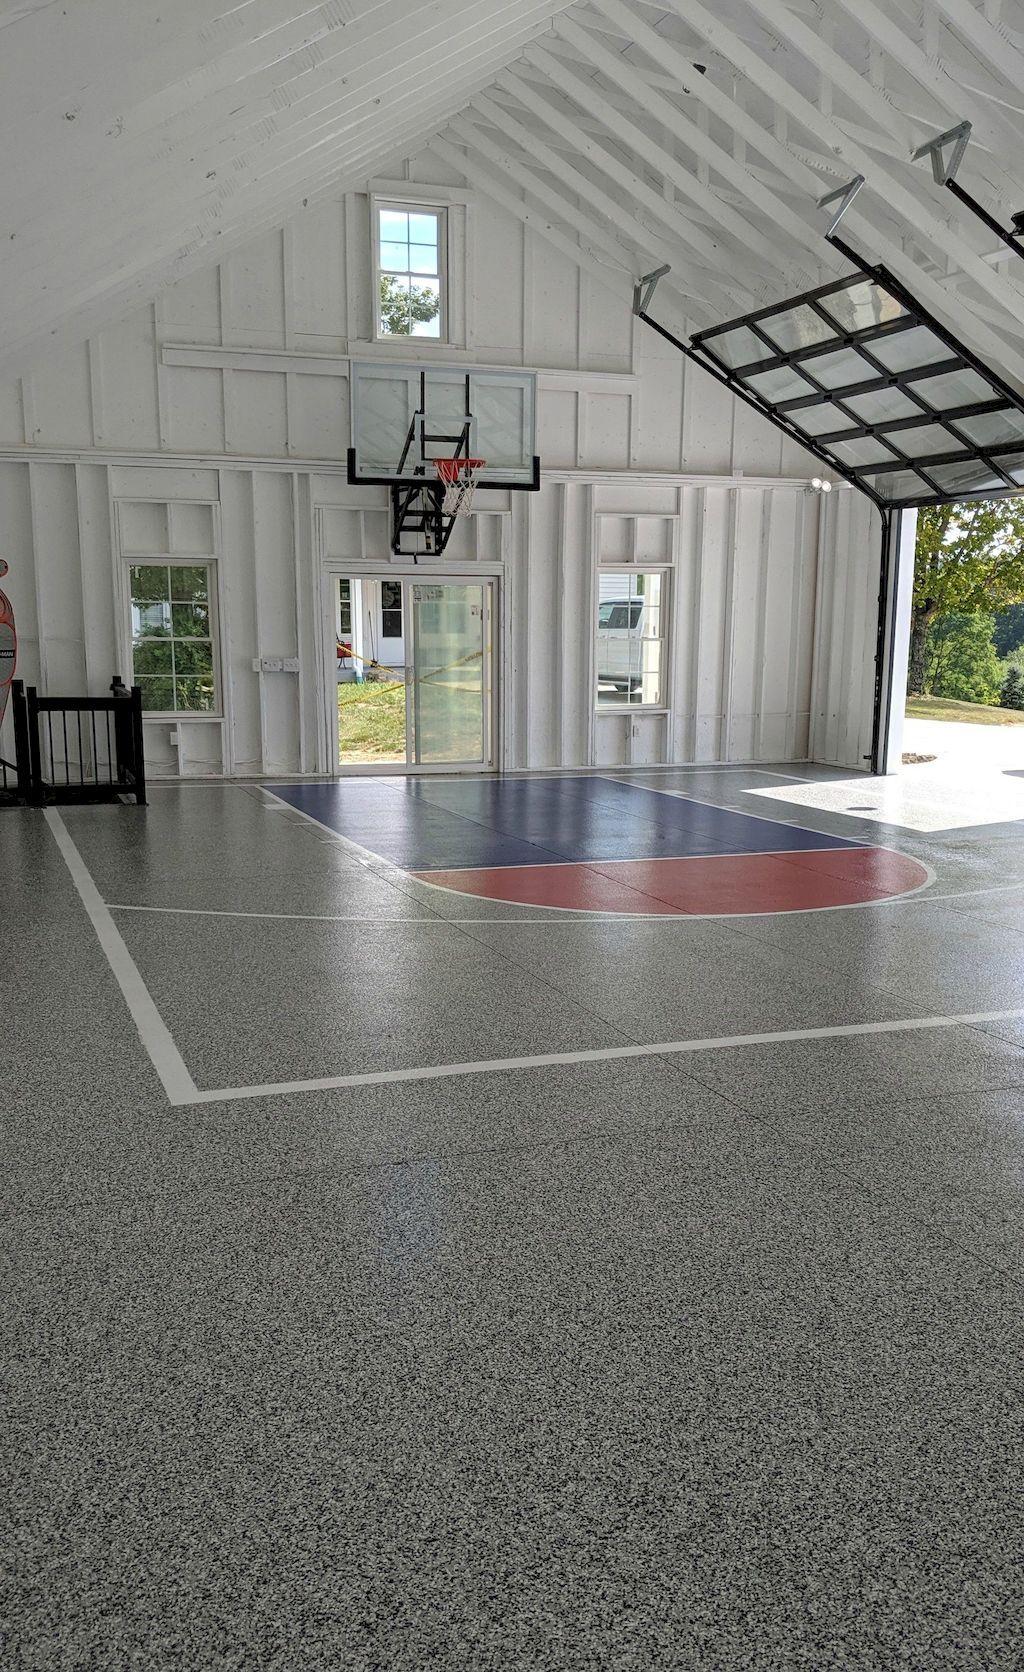 Shocking Best Floor Garage Tiles For Your House In 2020 Home Basketball Court Indoor Basketball Court Indoor Basketball